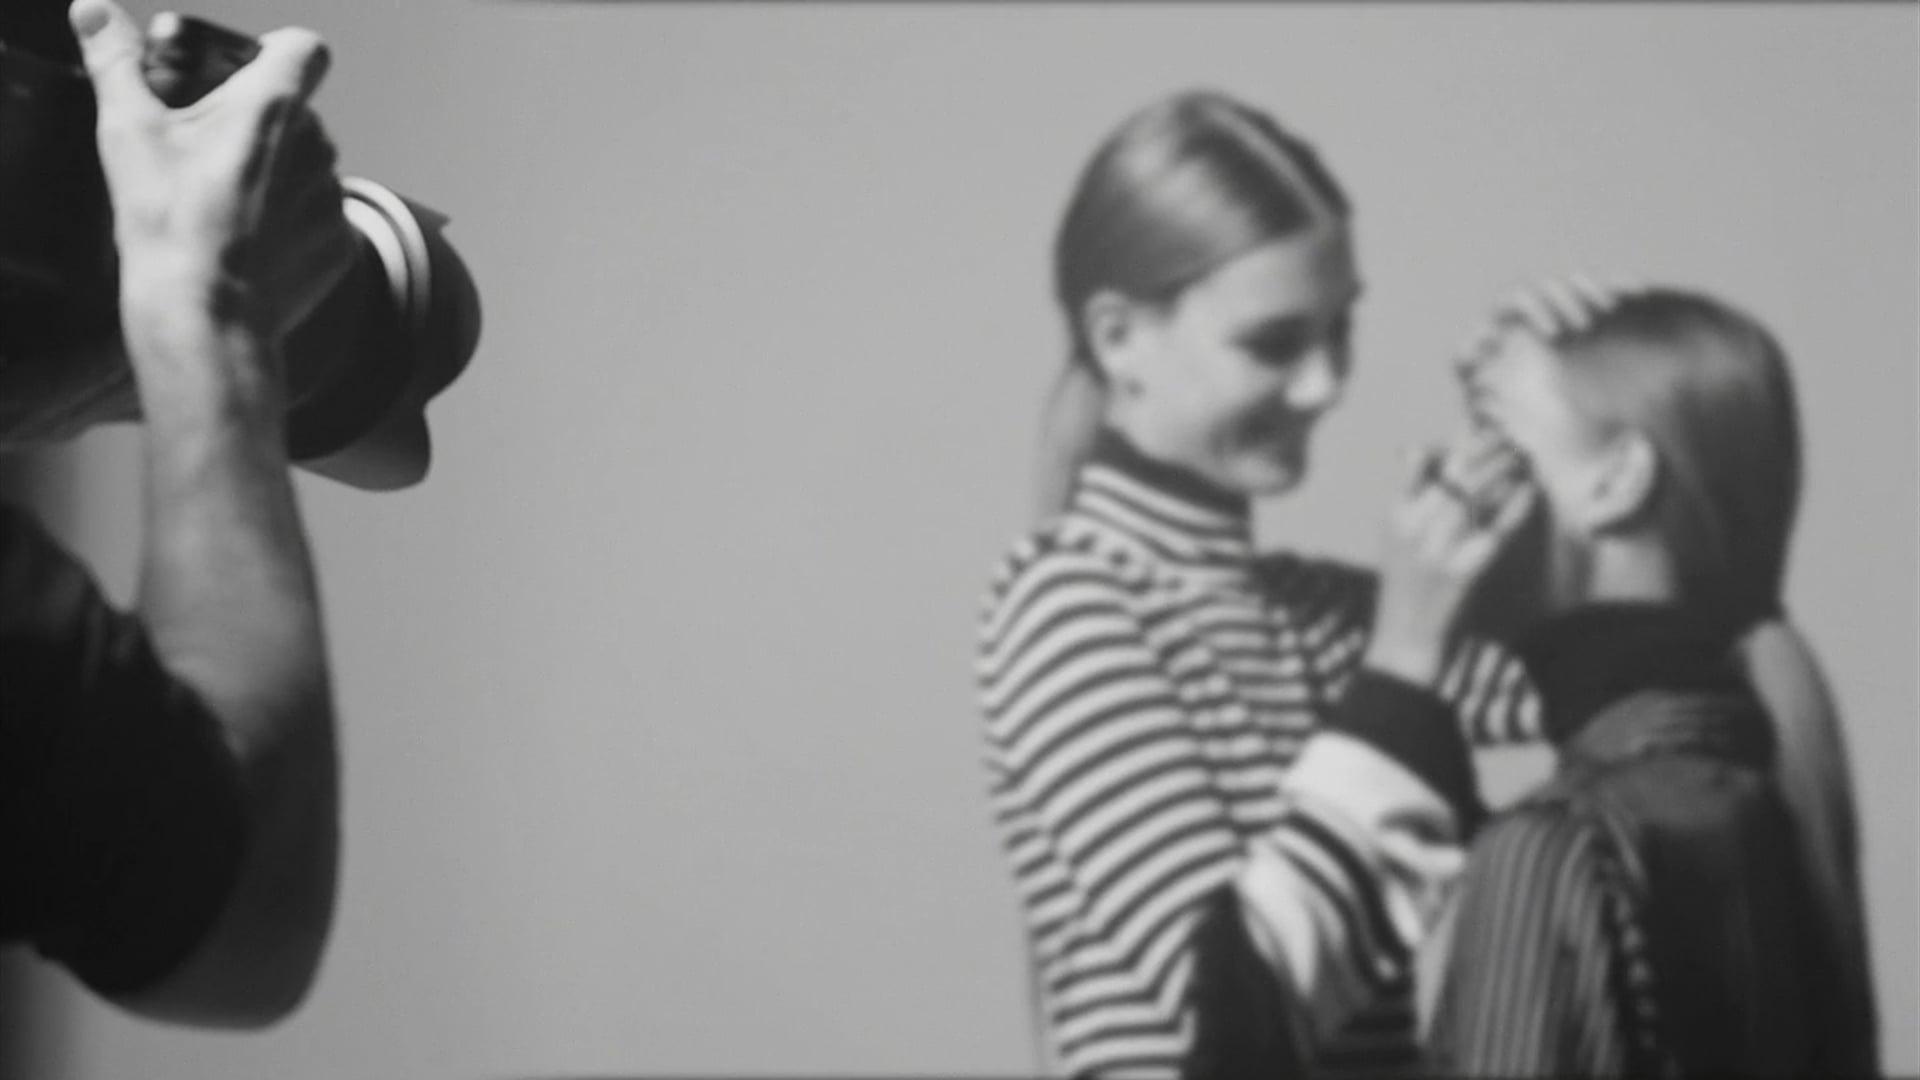 Hinter Den Kulissen BTS by Michel Comte, Berlin 2017